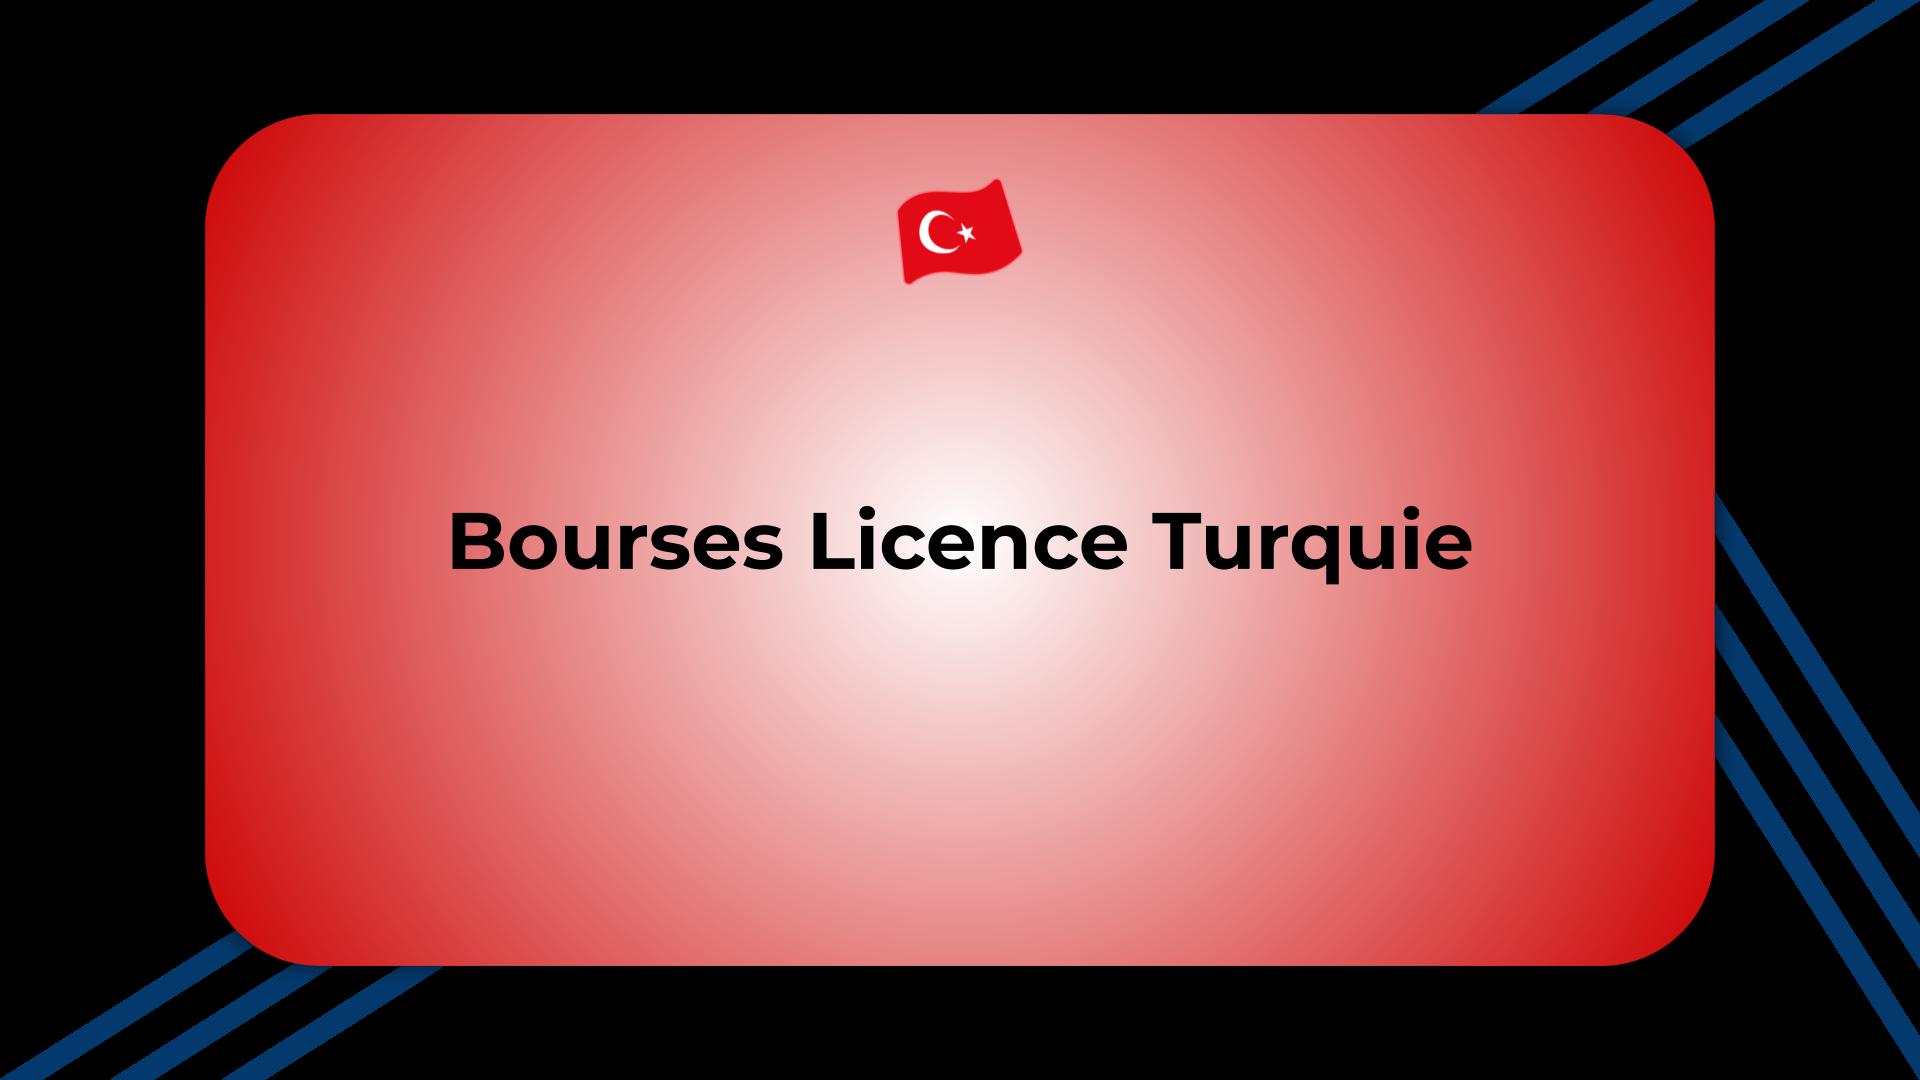 Bourses Licence Turquie